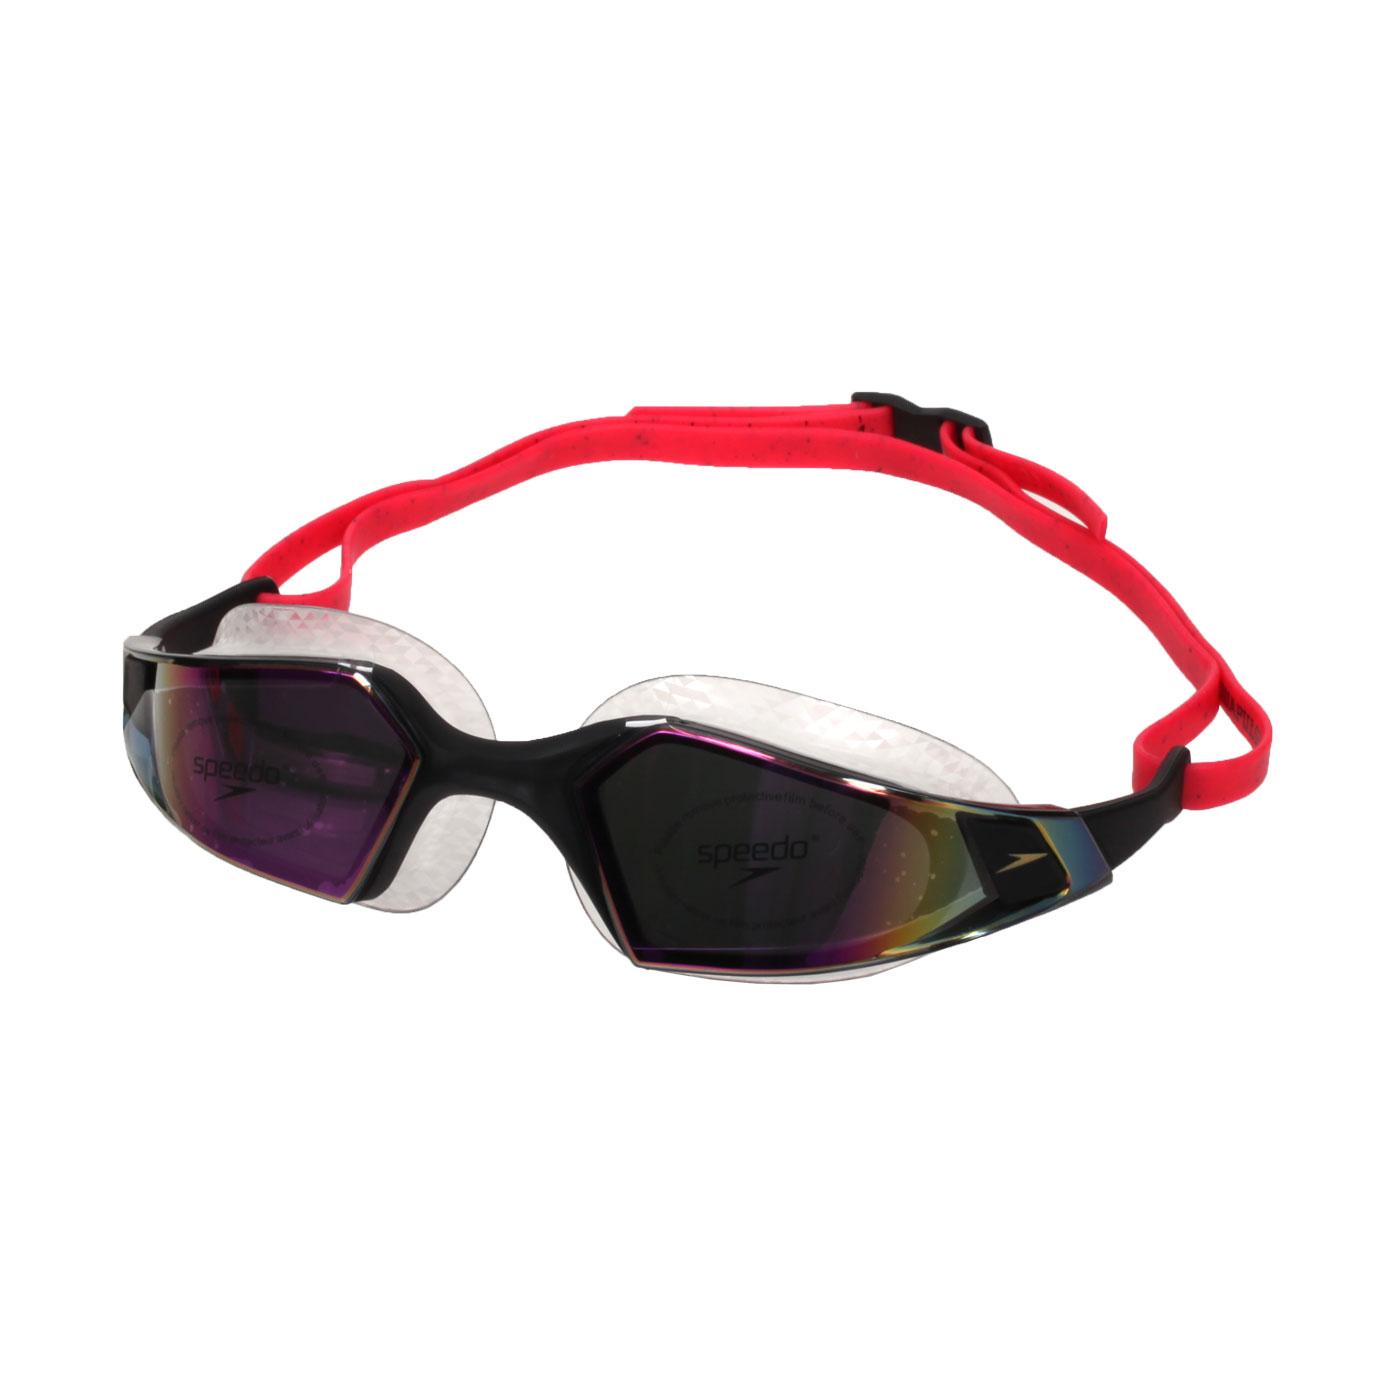 SPEEDO 成人運動泳鏡-鏡面 Aquapulse Pro SD812265D638 - 黑紫